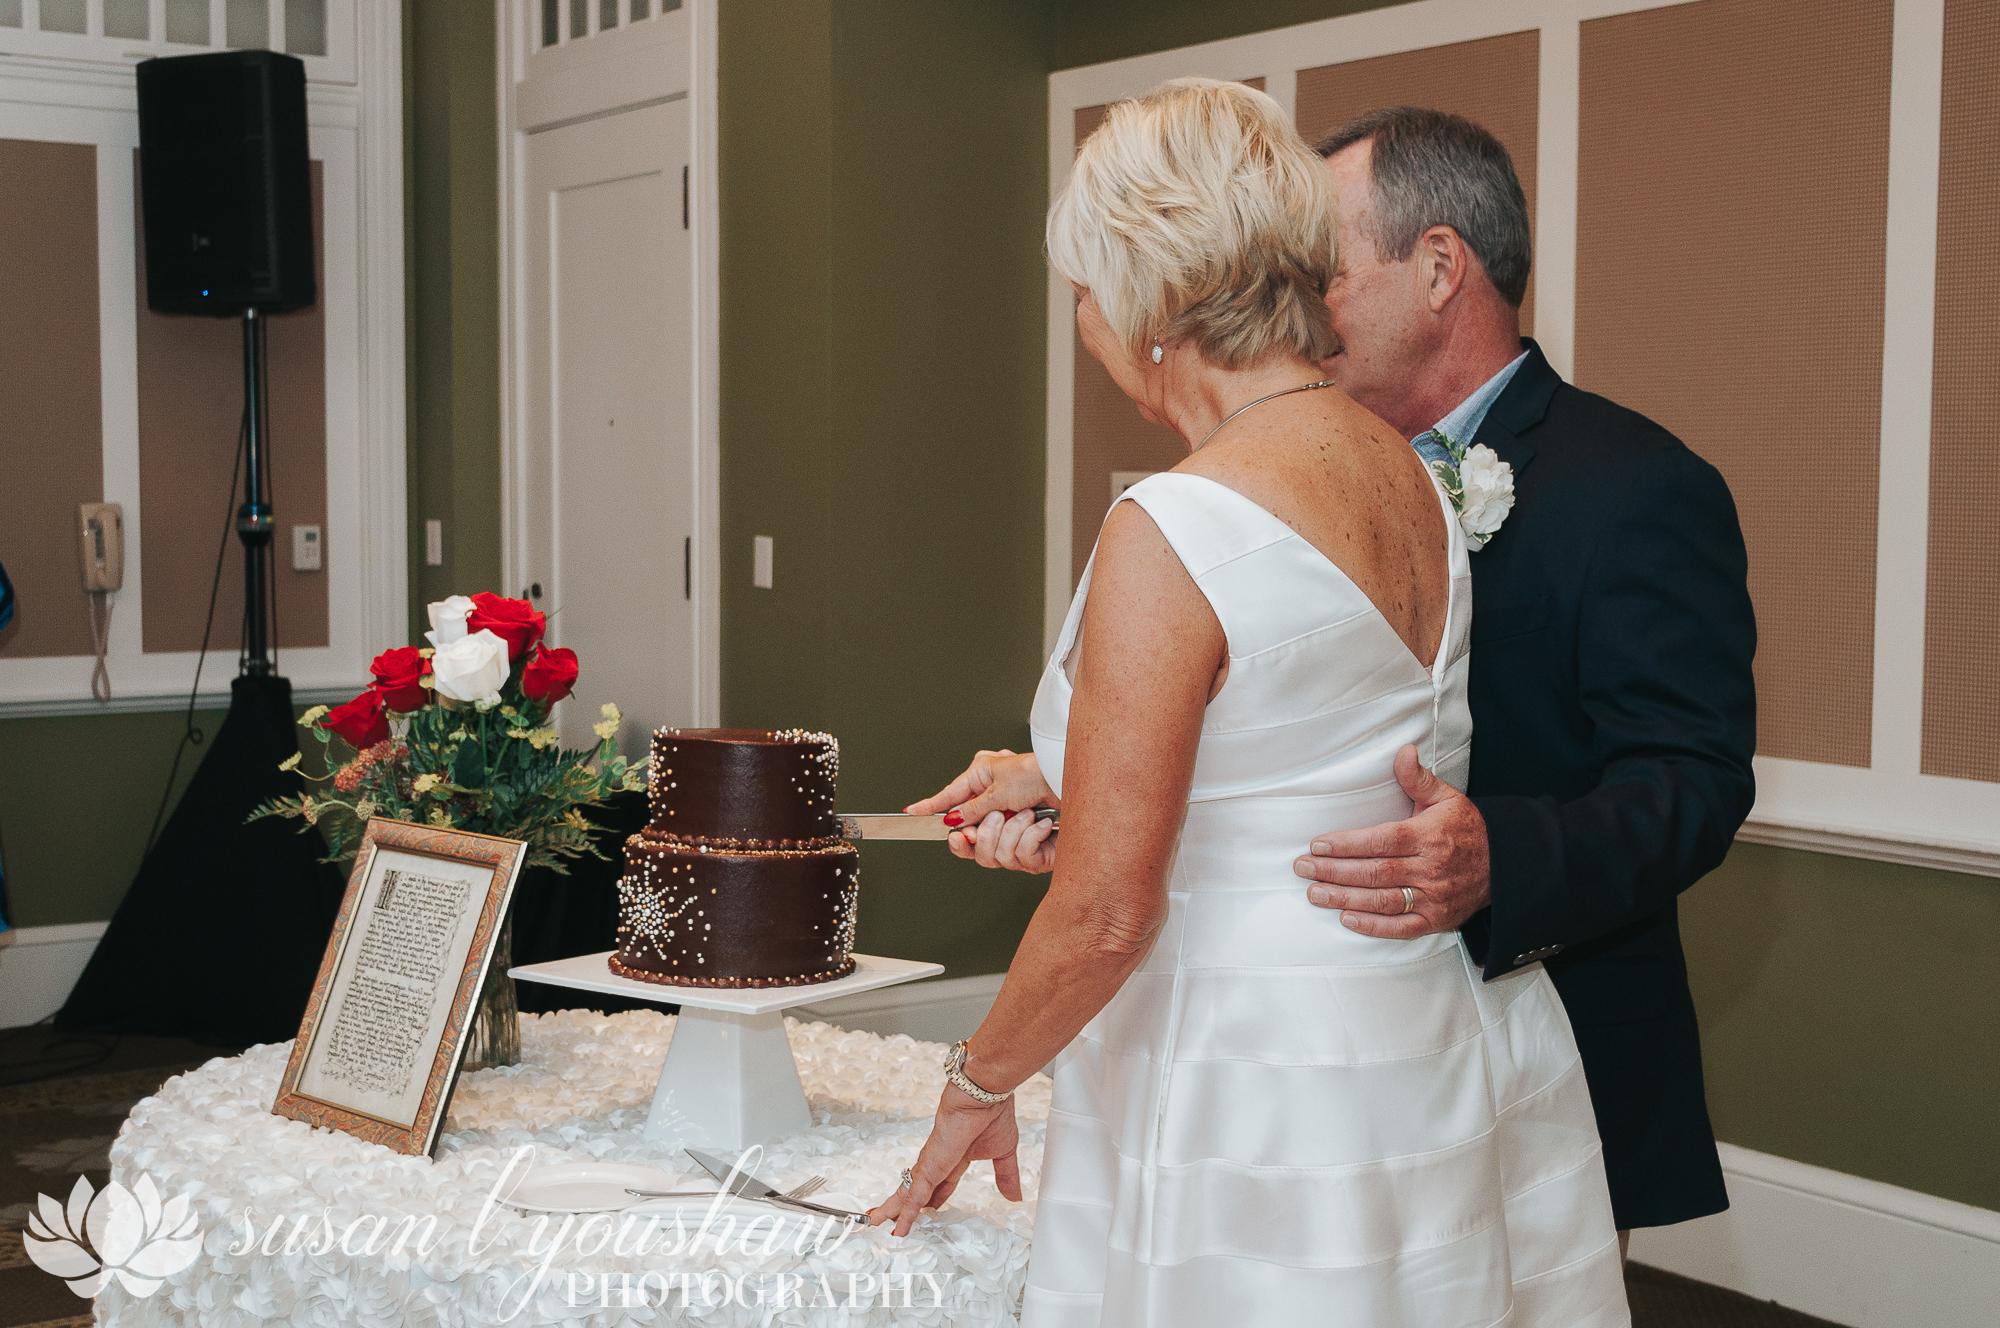 BLOG Carolyn Adams and Jim McCune 07-04-2018 SLY Photography-146.jpg